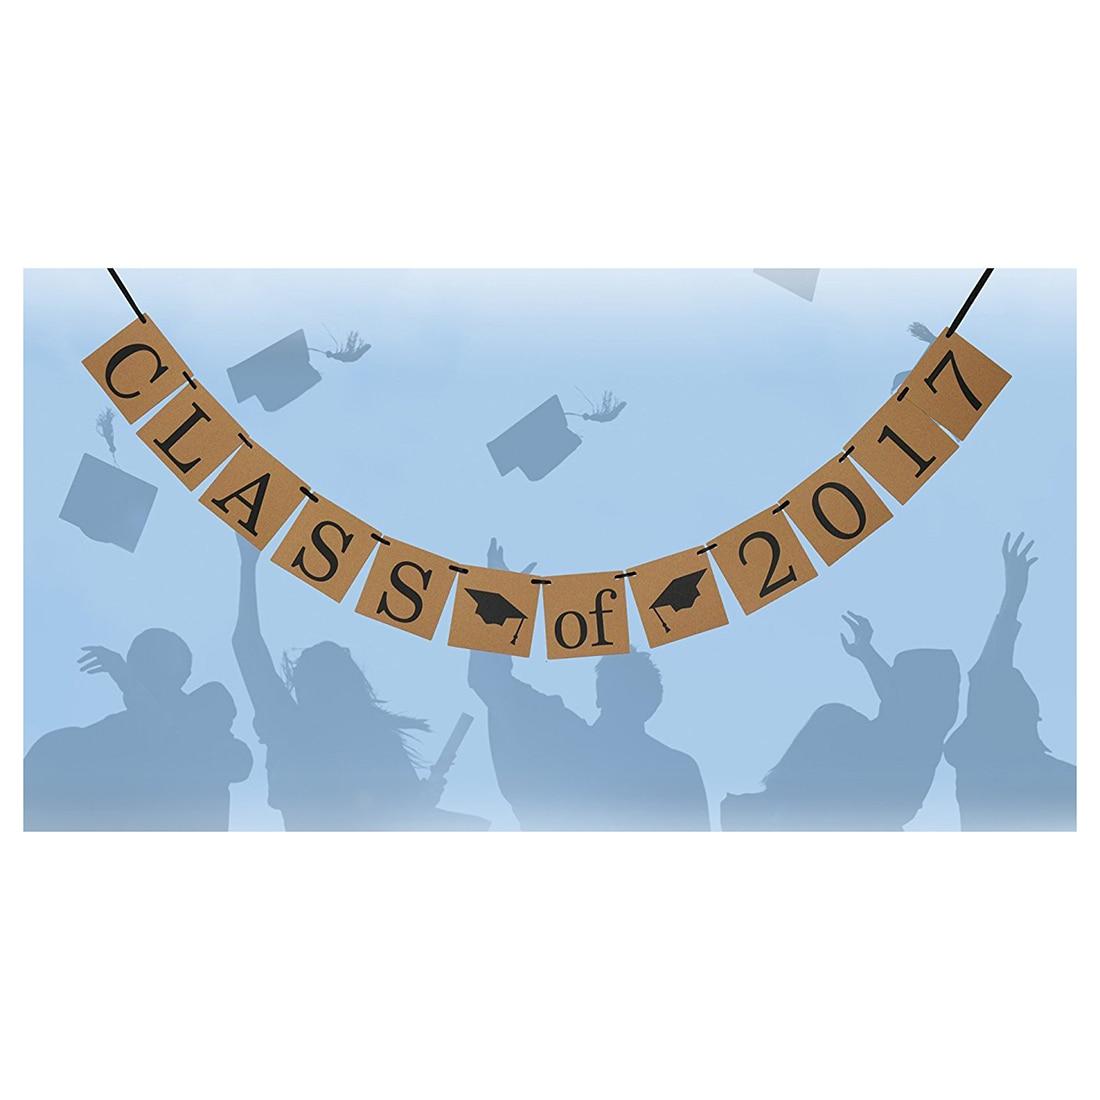 Class of 2017 Banner - Graduation Sign Photo Props - Graduate Party Decorations , High School Graduation, College Grad Decor